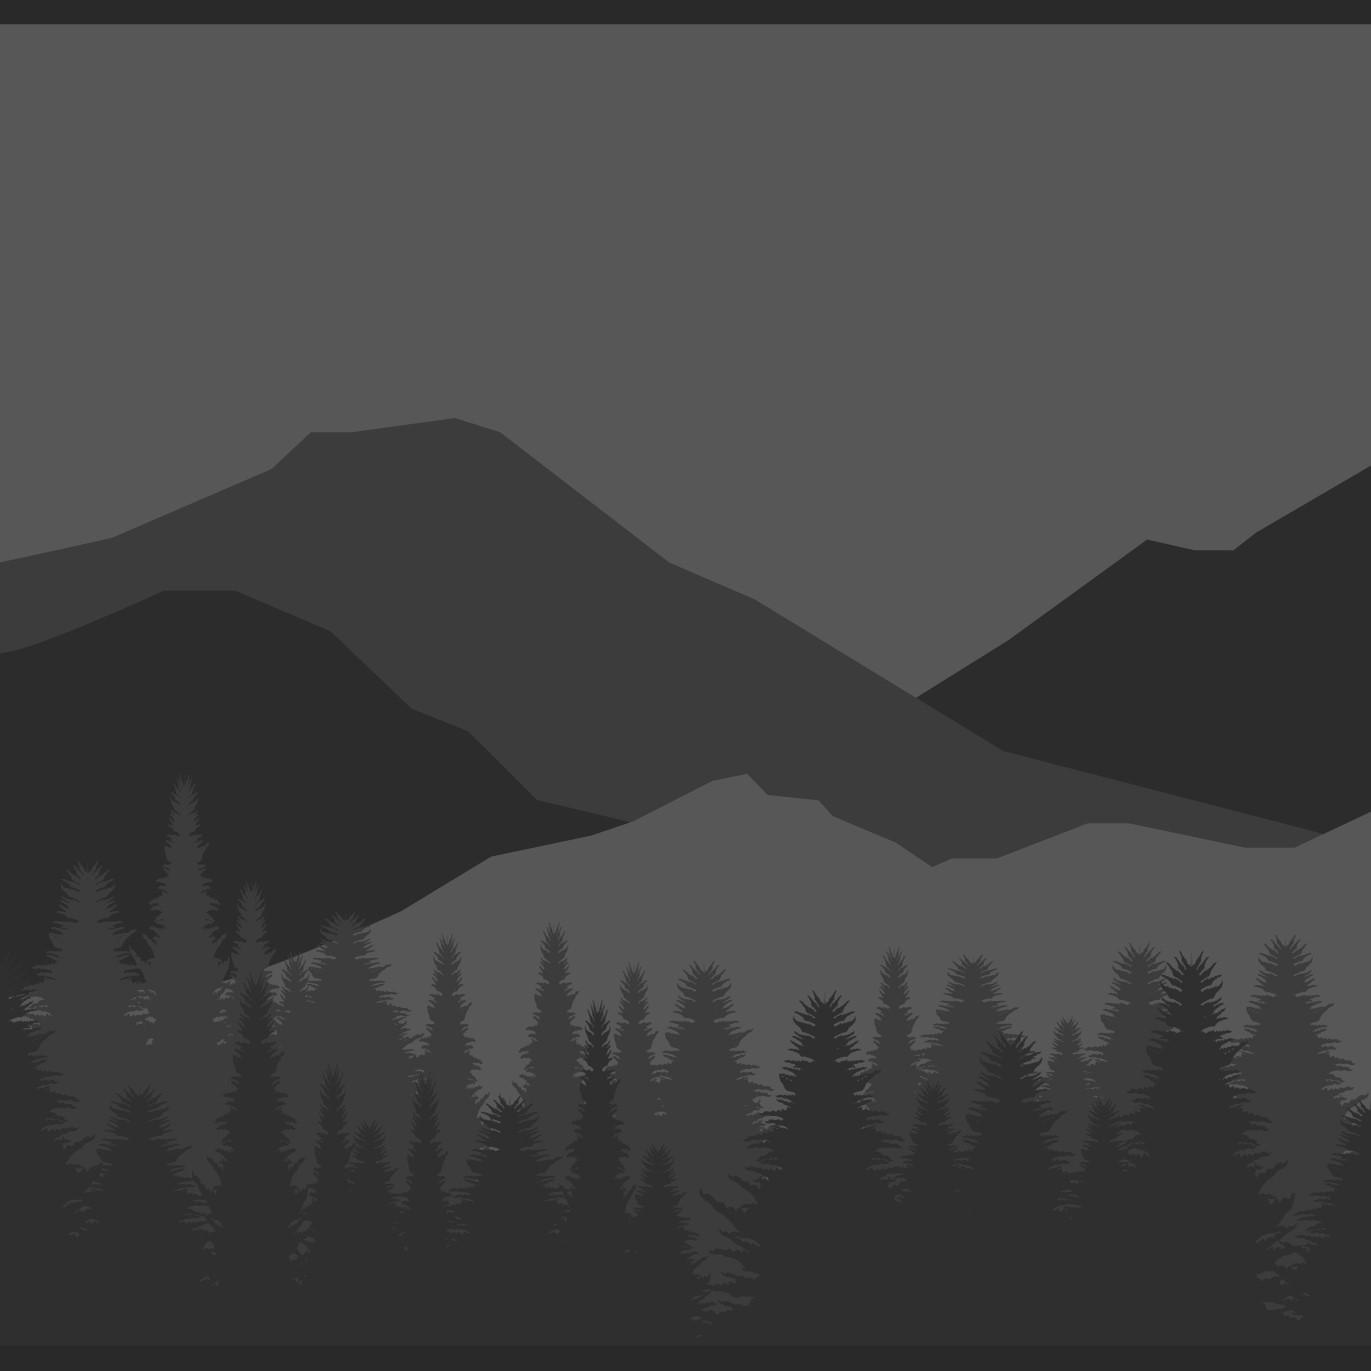 Mountain Wlderness-9x12